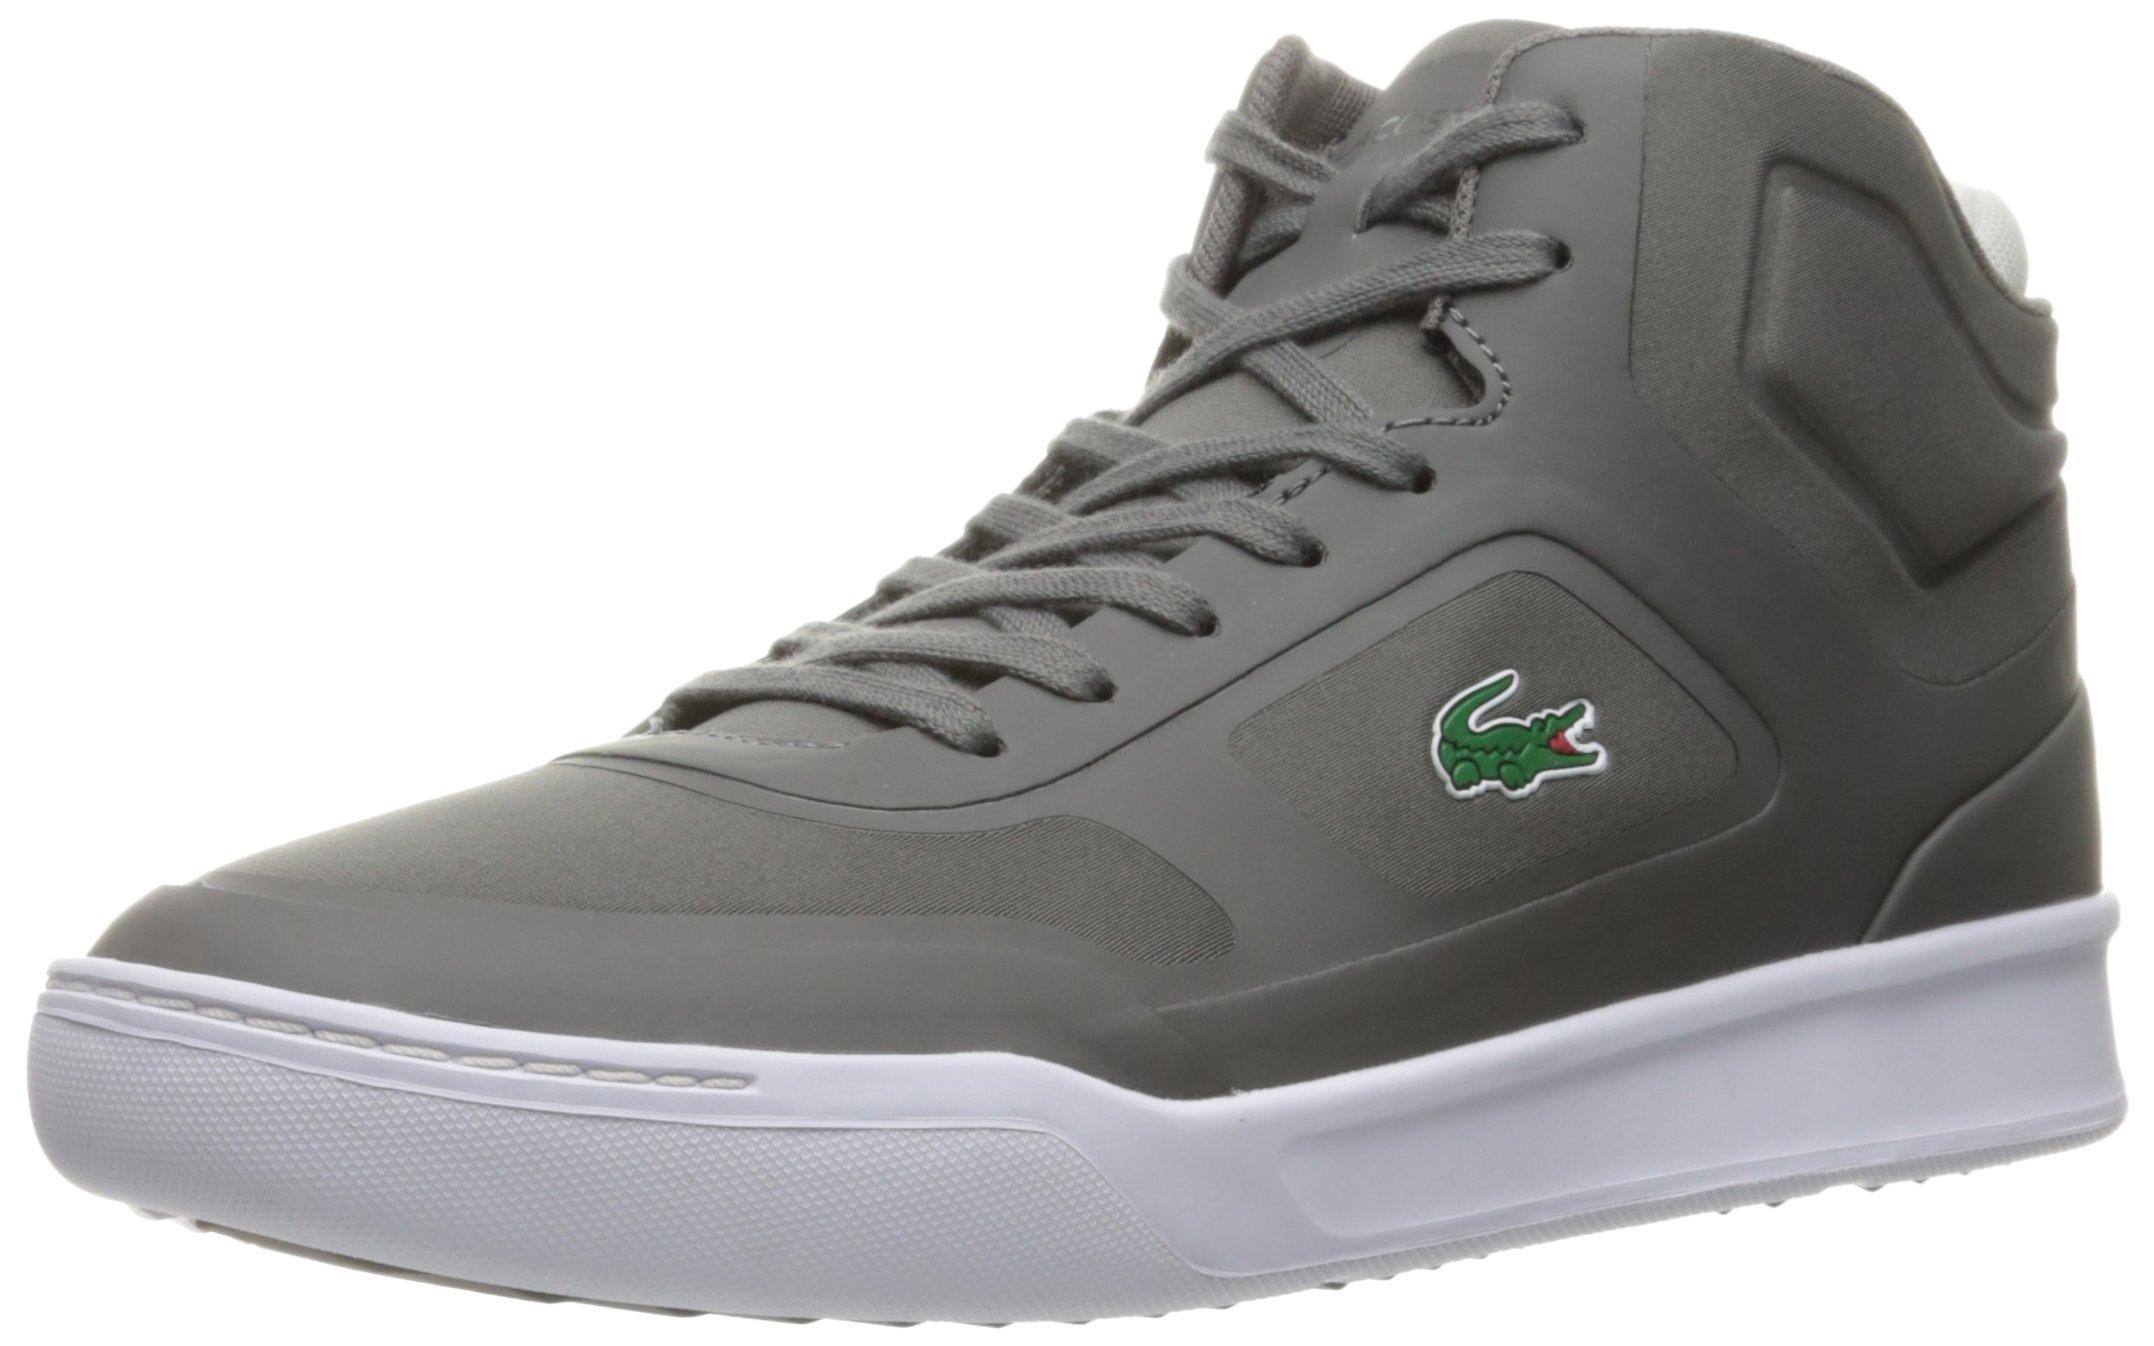 Lacoste Men's Explorateur Mid Spt 316 1 Spm Fashion Sneaker, Dark Grey, 12 M US